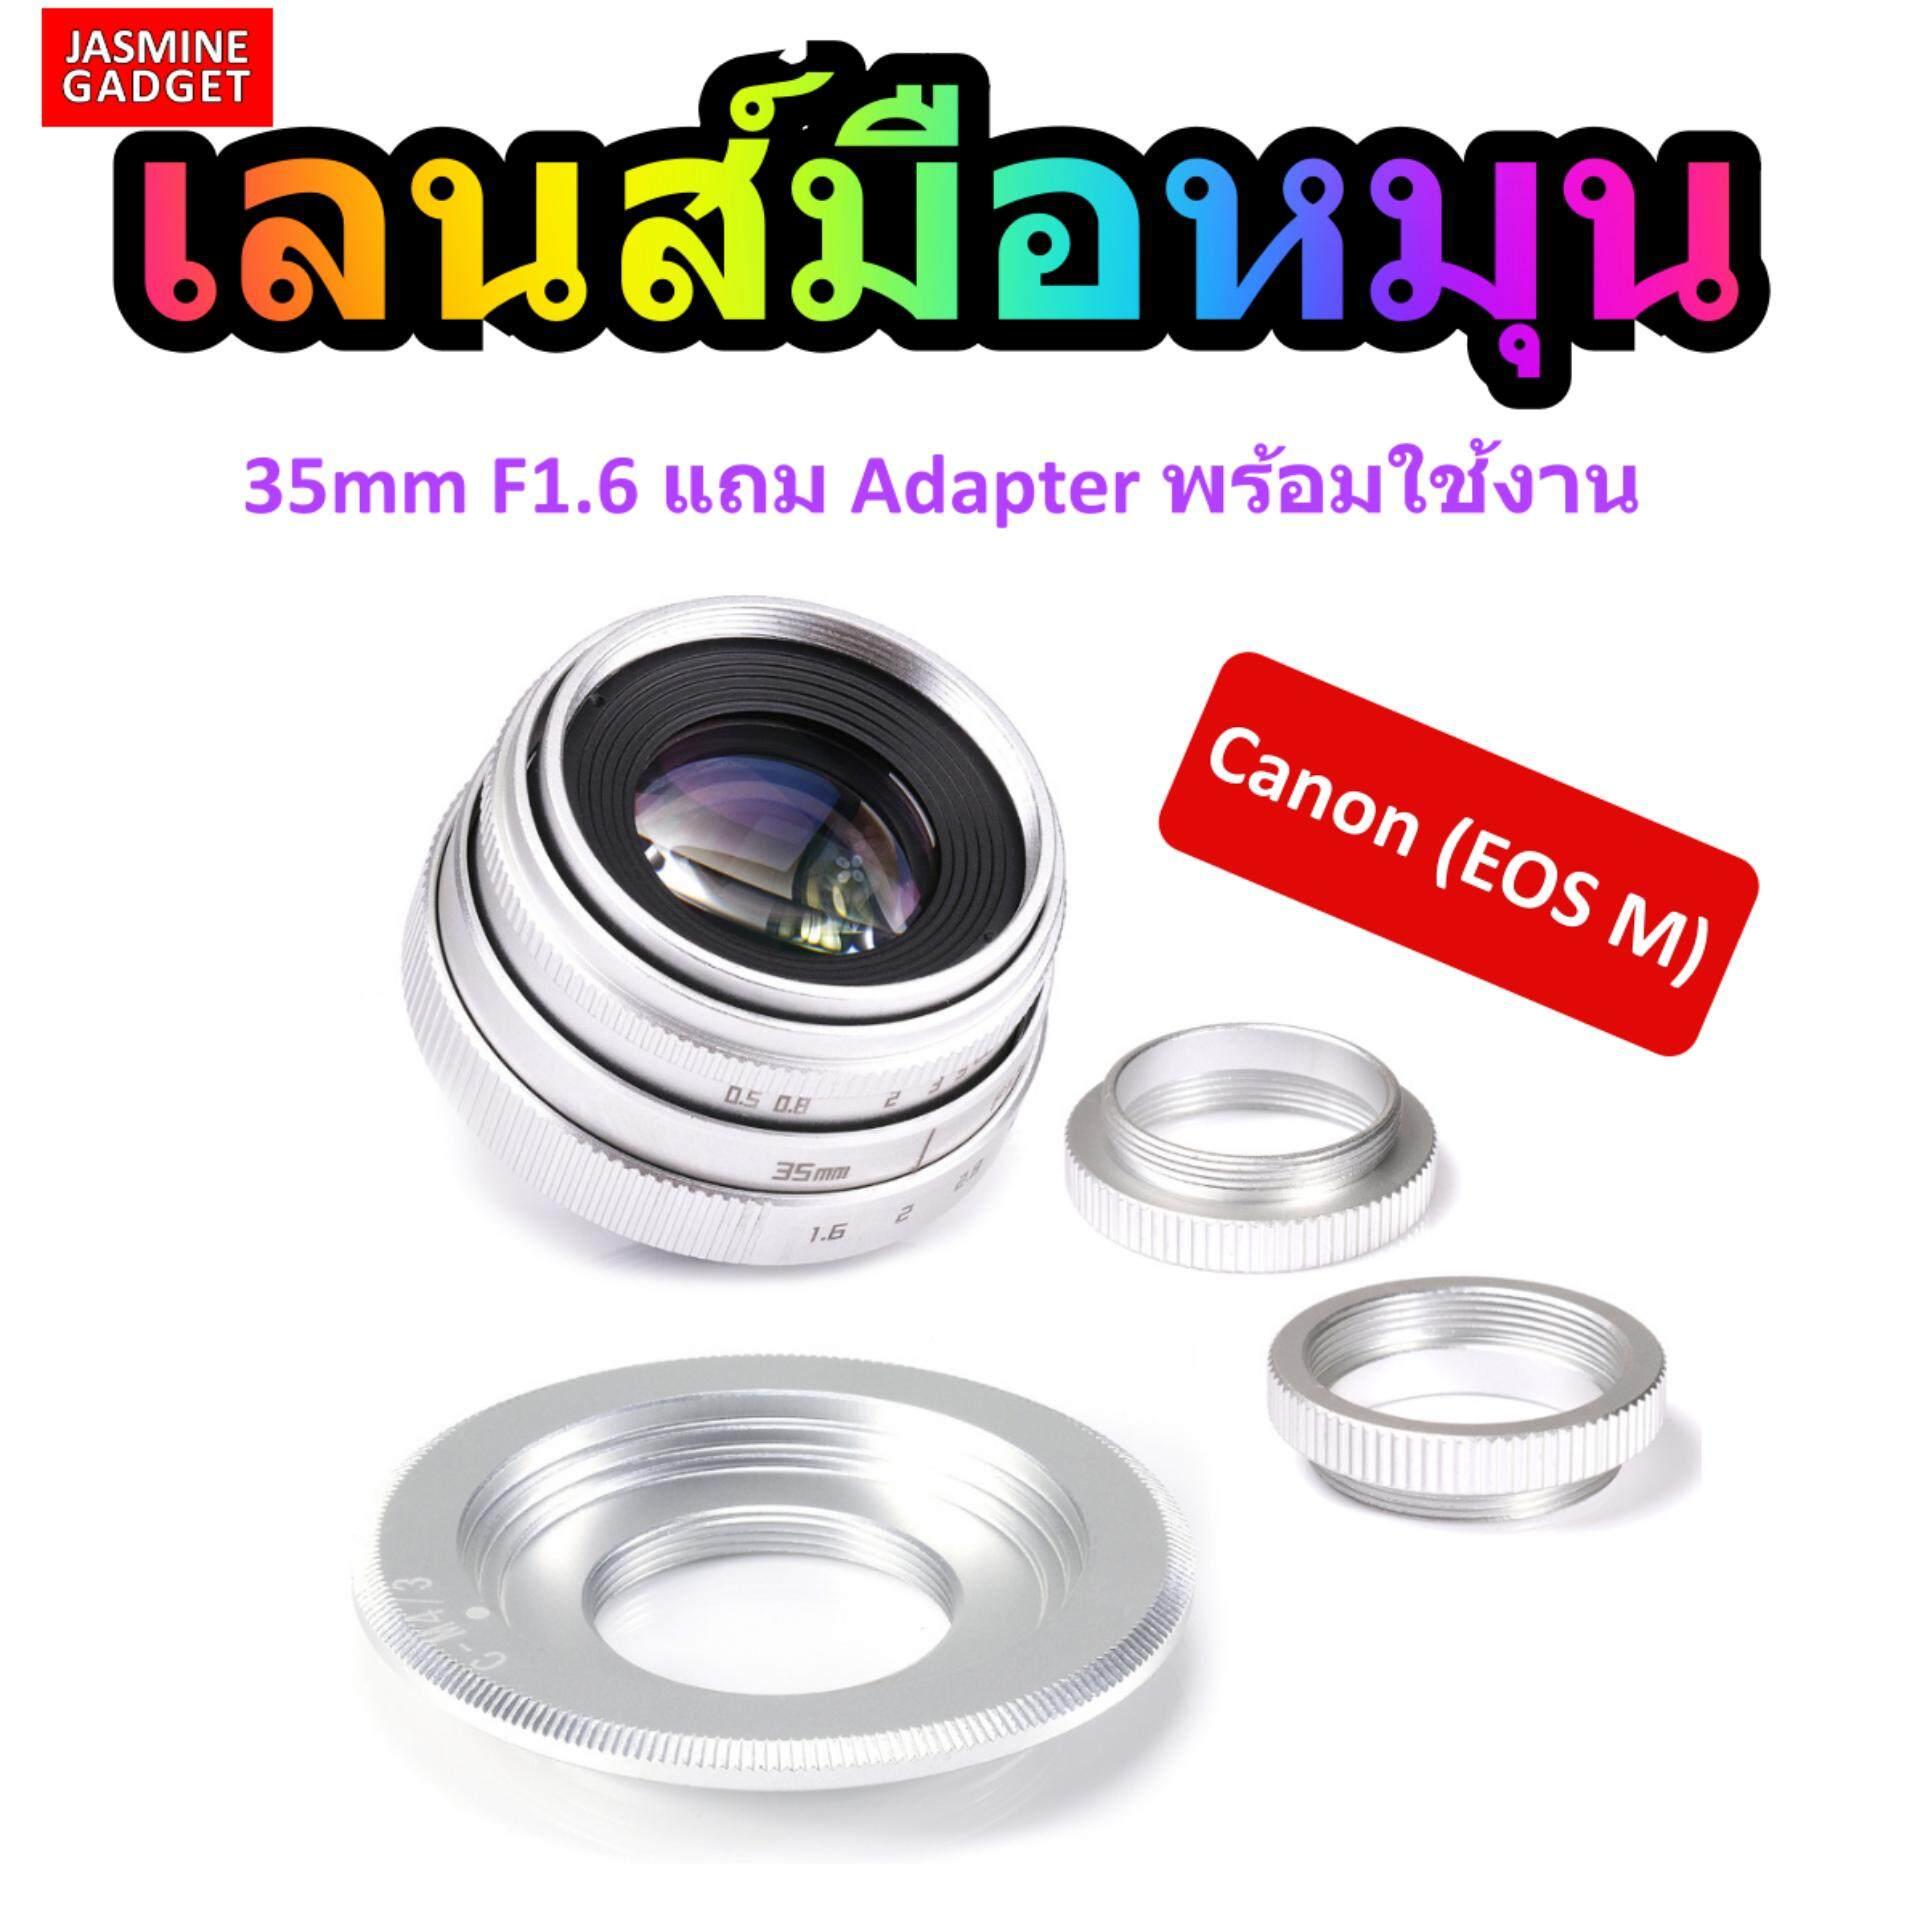 Fujian Cctv Lens 35mm F1.6 Mark Ii เลนส์มือหมุน Mirrorless ละลายหลัง + พร้อม Adapter C-Eos.m For ค่าย Canon Mirrorless.